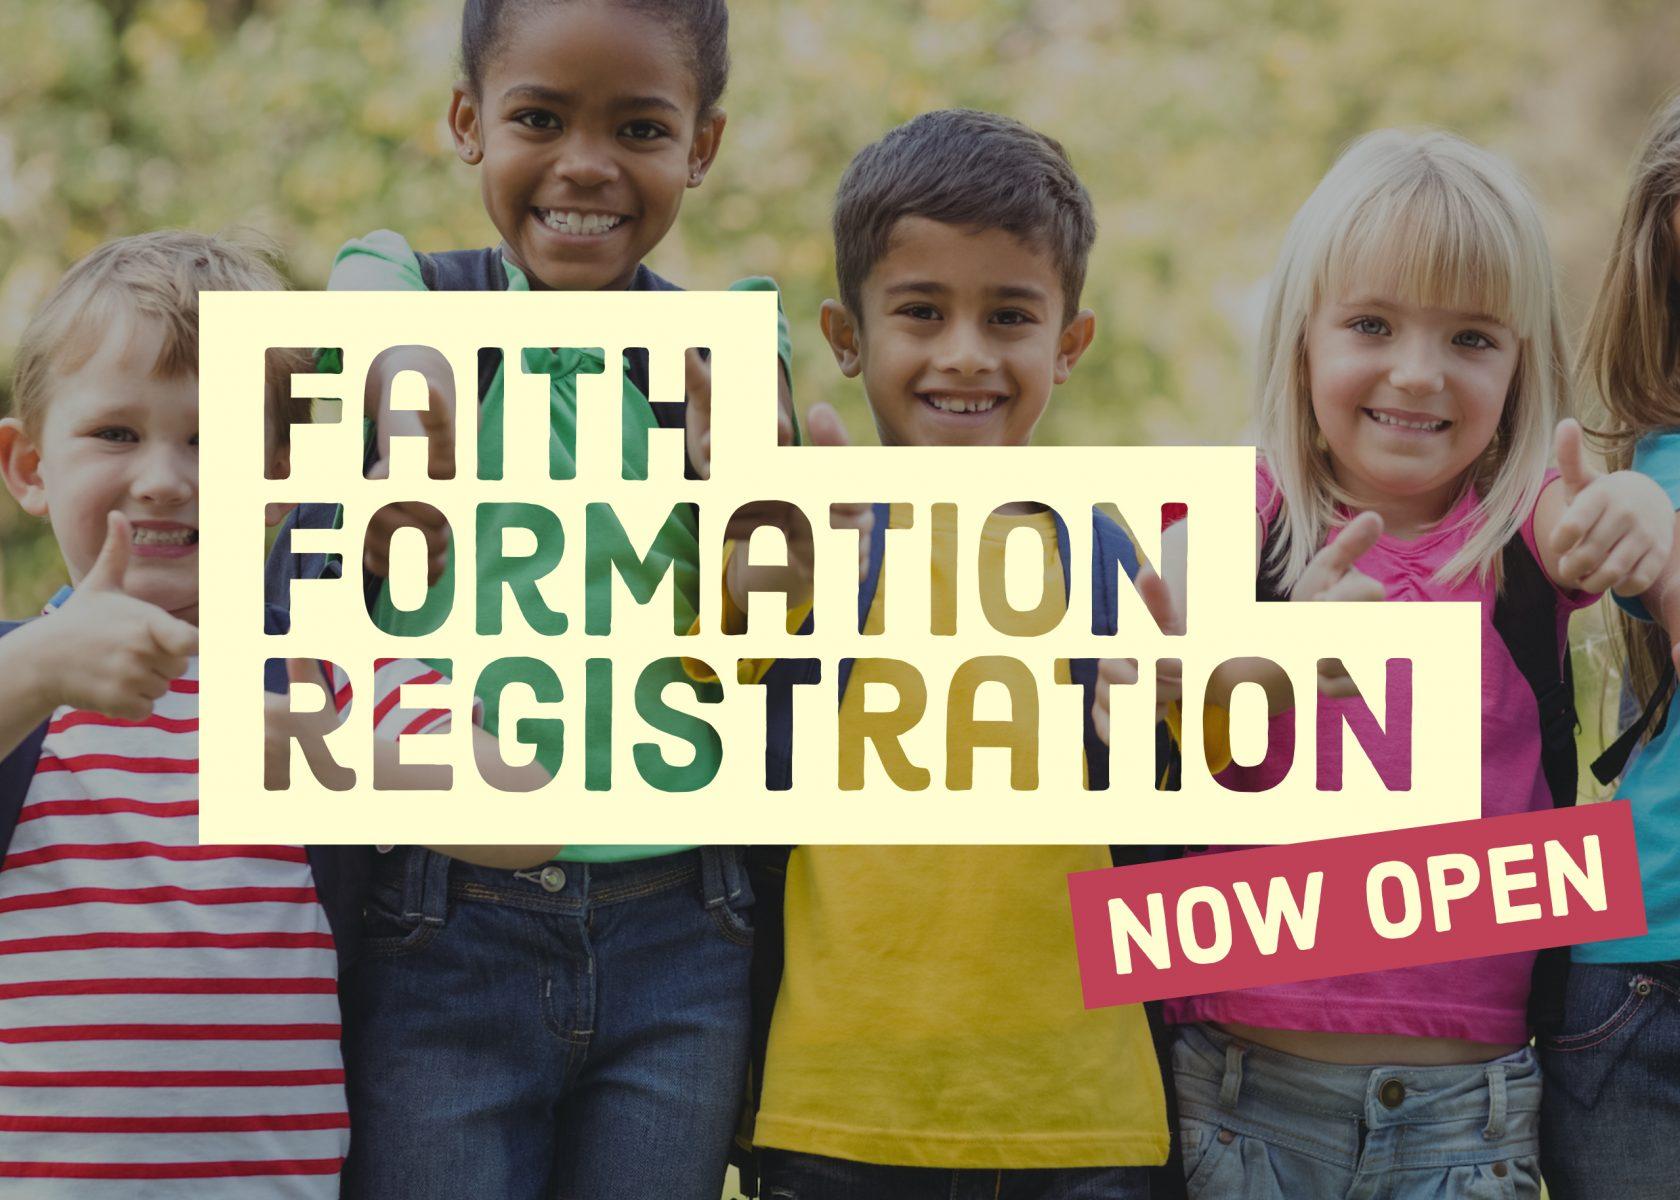 Faith Formation Registration